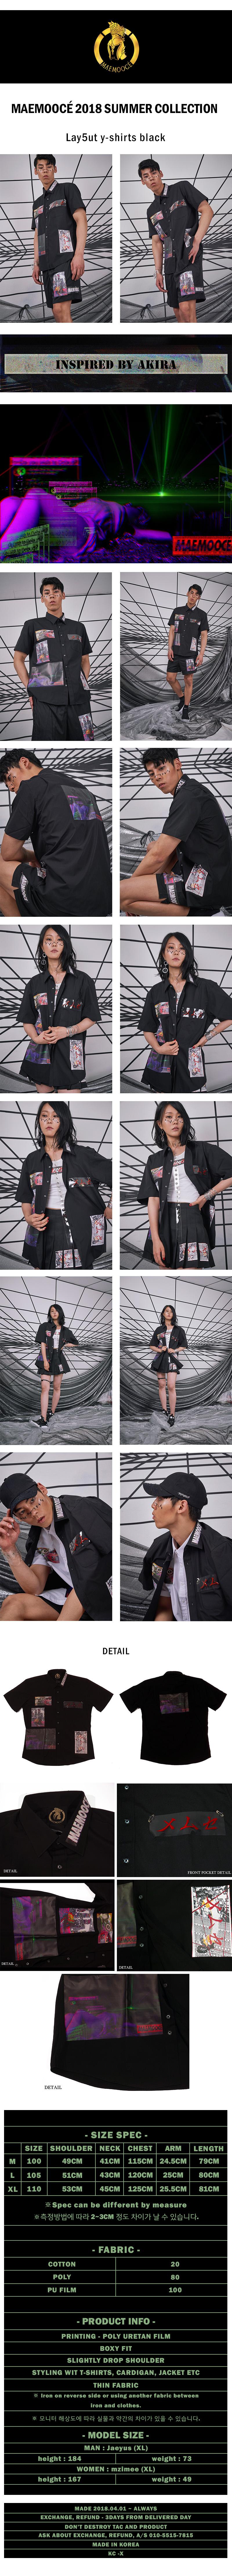 Lay5ut y-shirts black copy.JPG